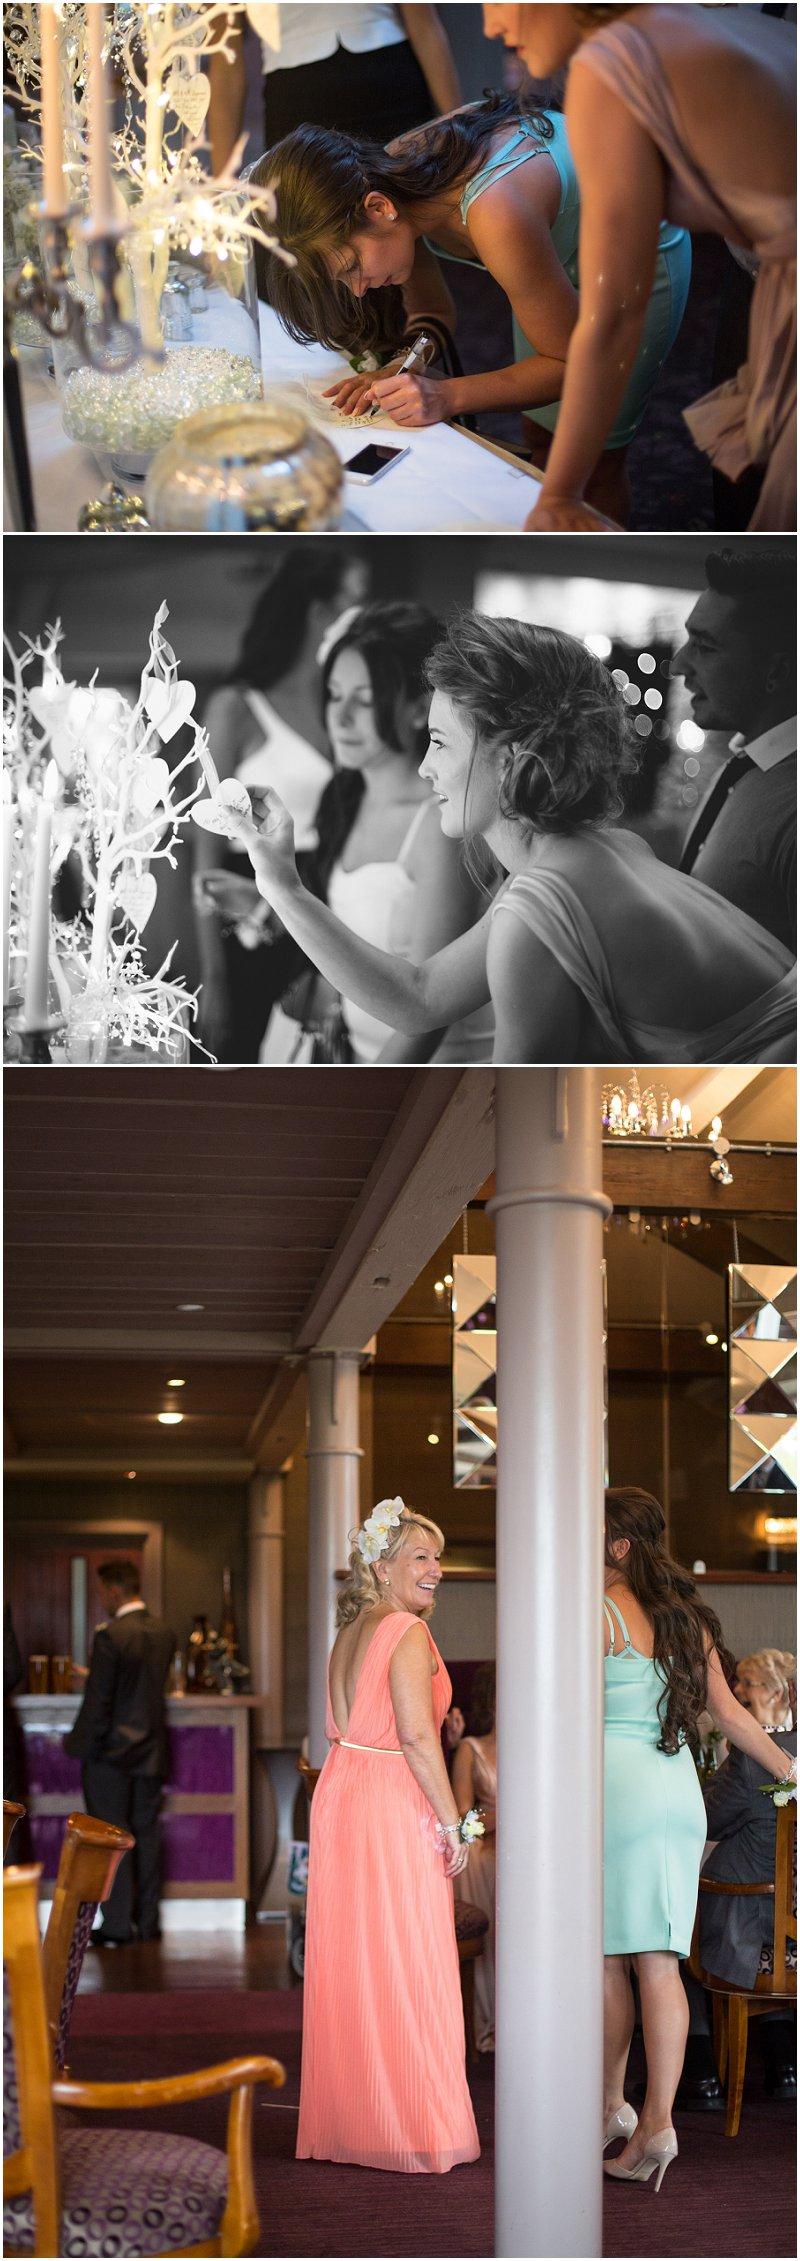 Guests sign wish tree at wedding